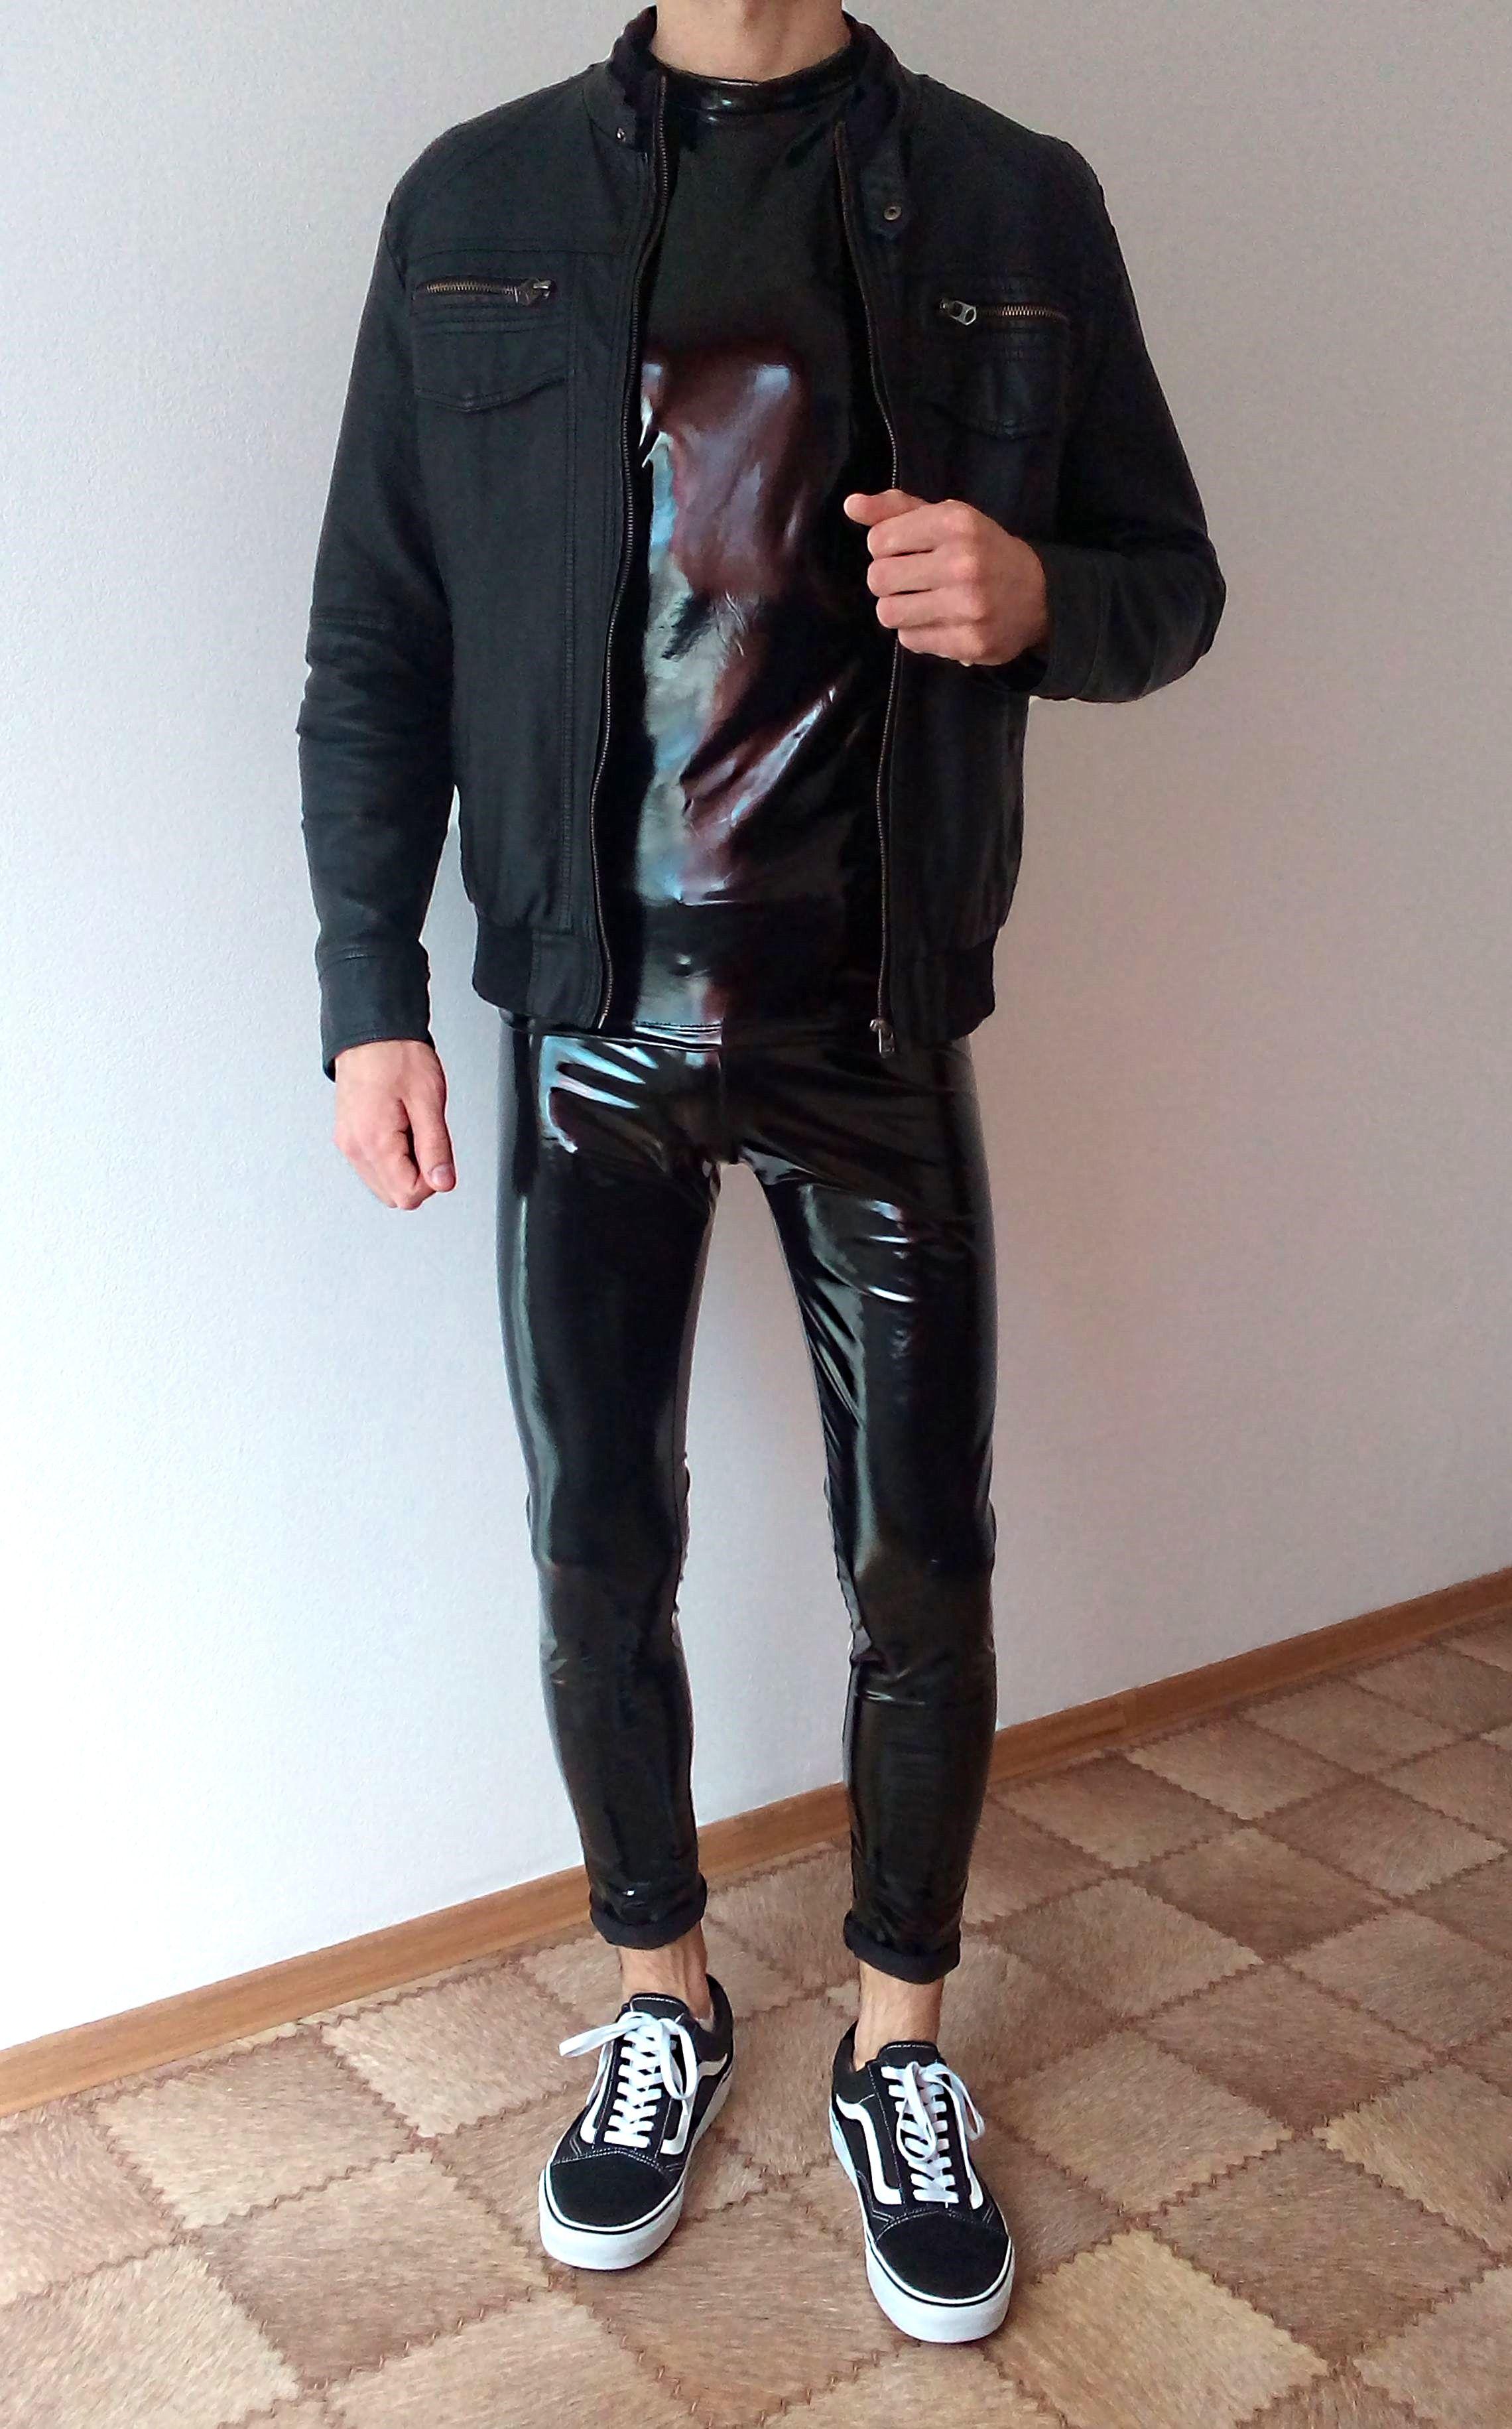 744f94106445 vans old skool black rock outfit | boys guys in leather pants tights ...